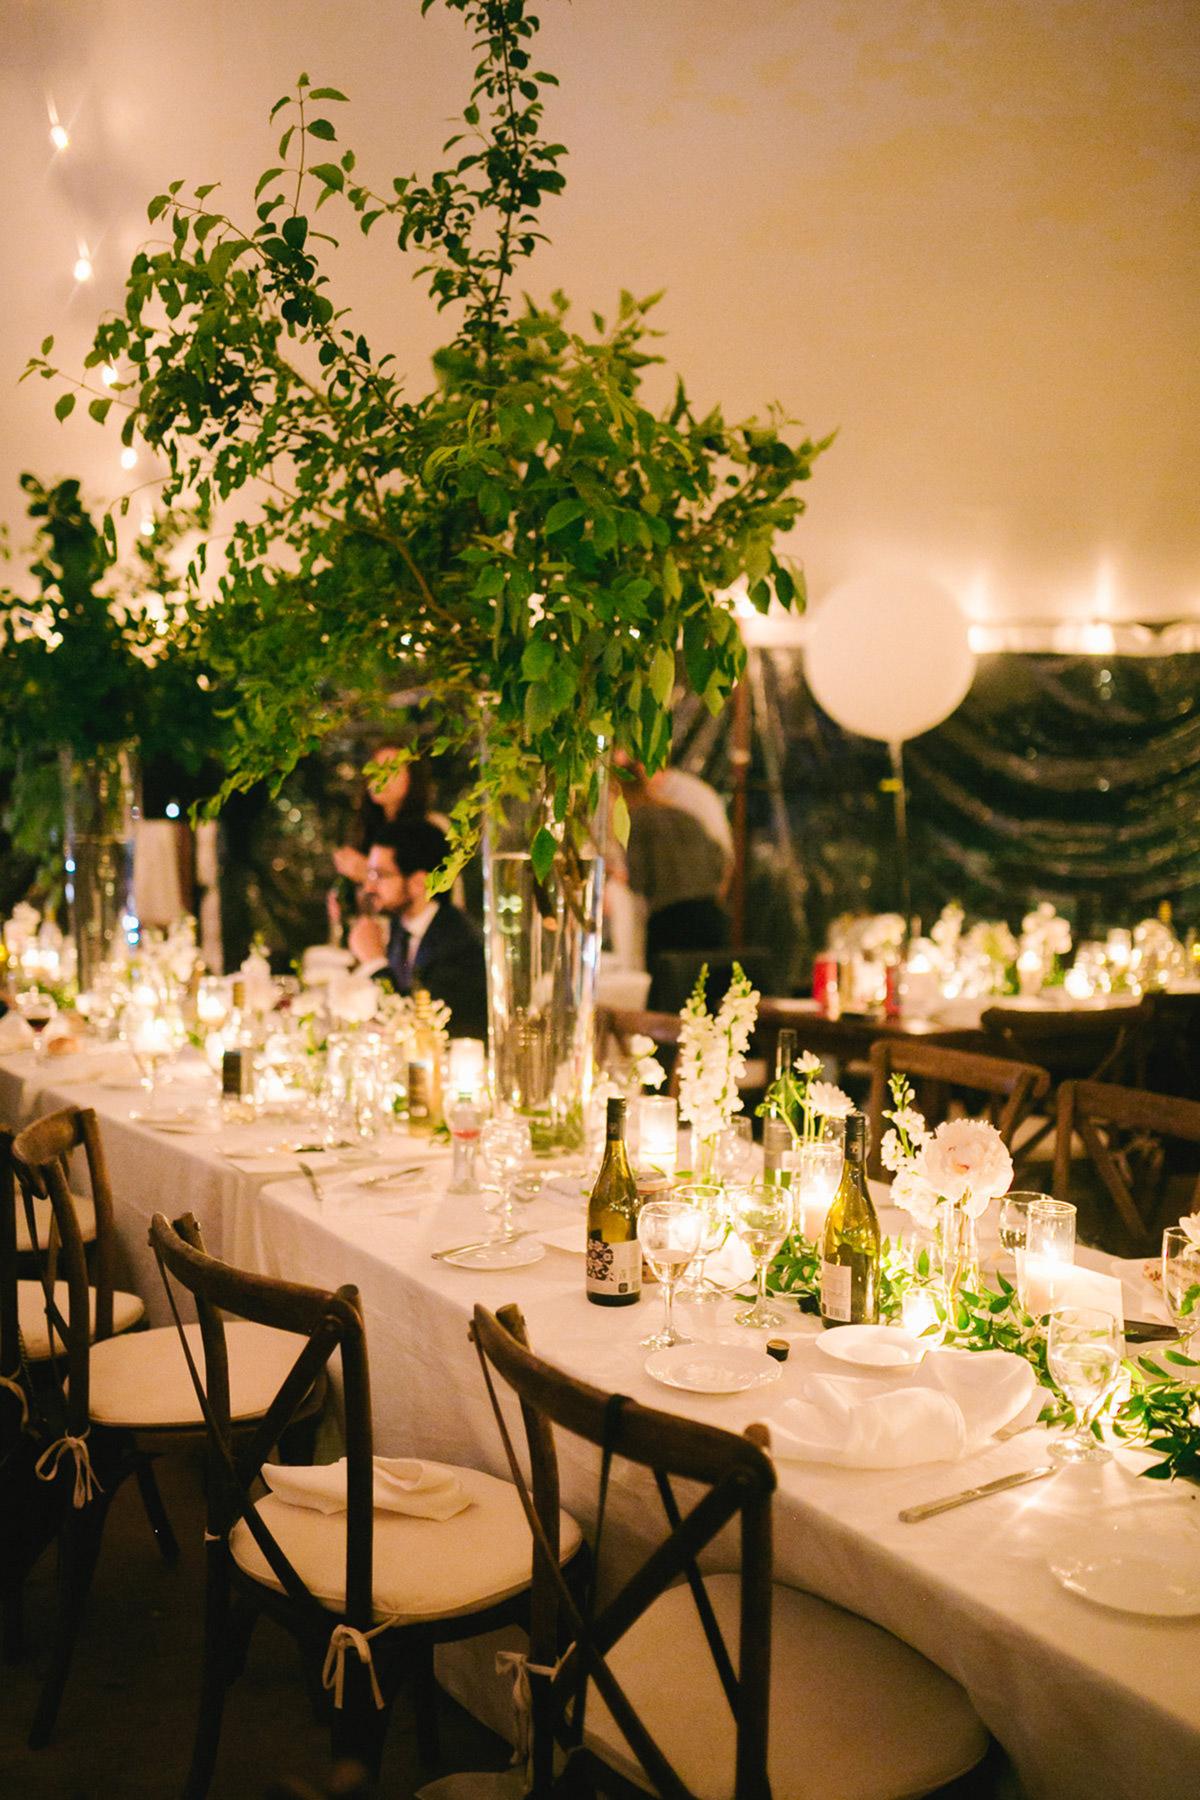 artiese-studios-vineyard-bride-swish-list-private-estate-cambridge-wedding-19.jpg